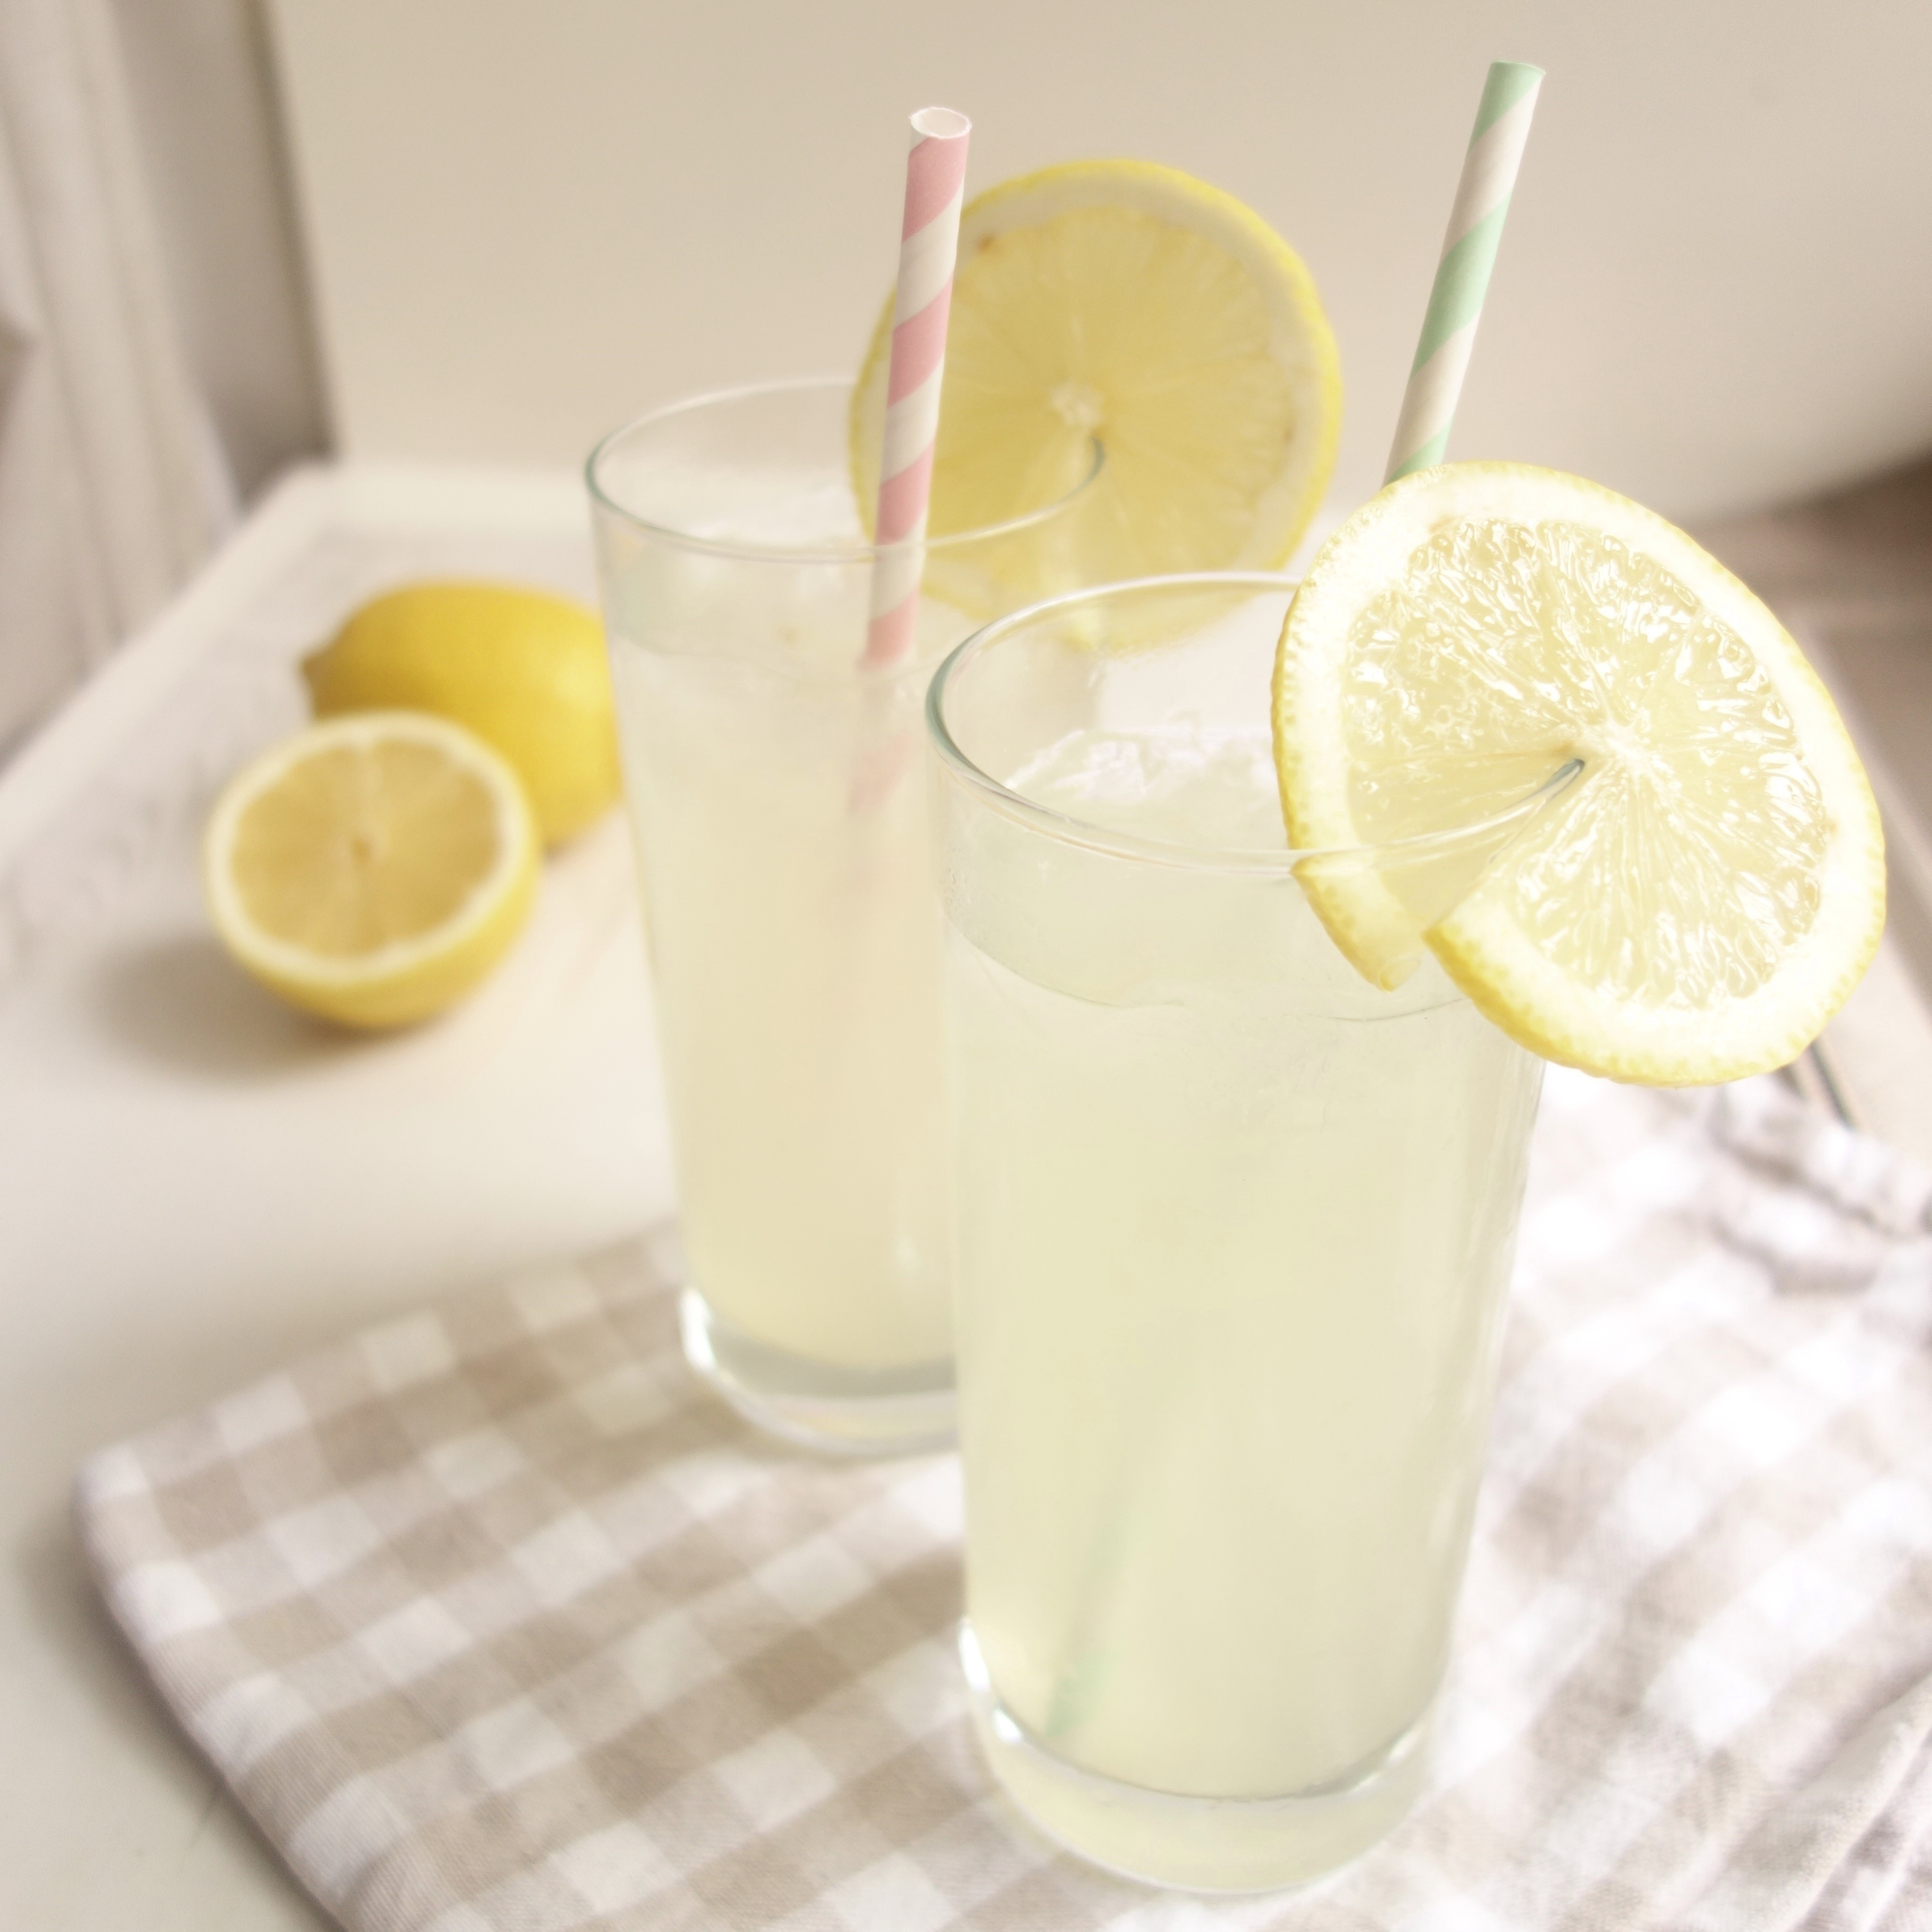 Homemade Cloudy Lemonade